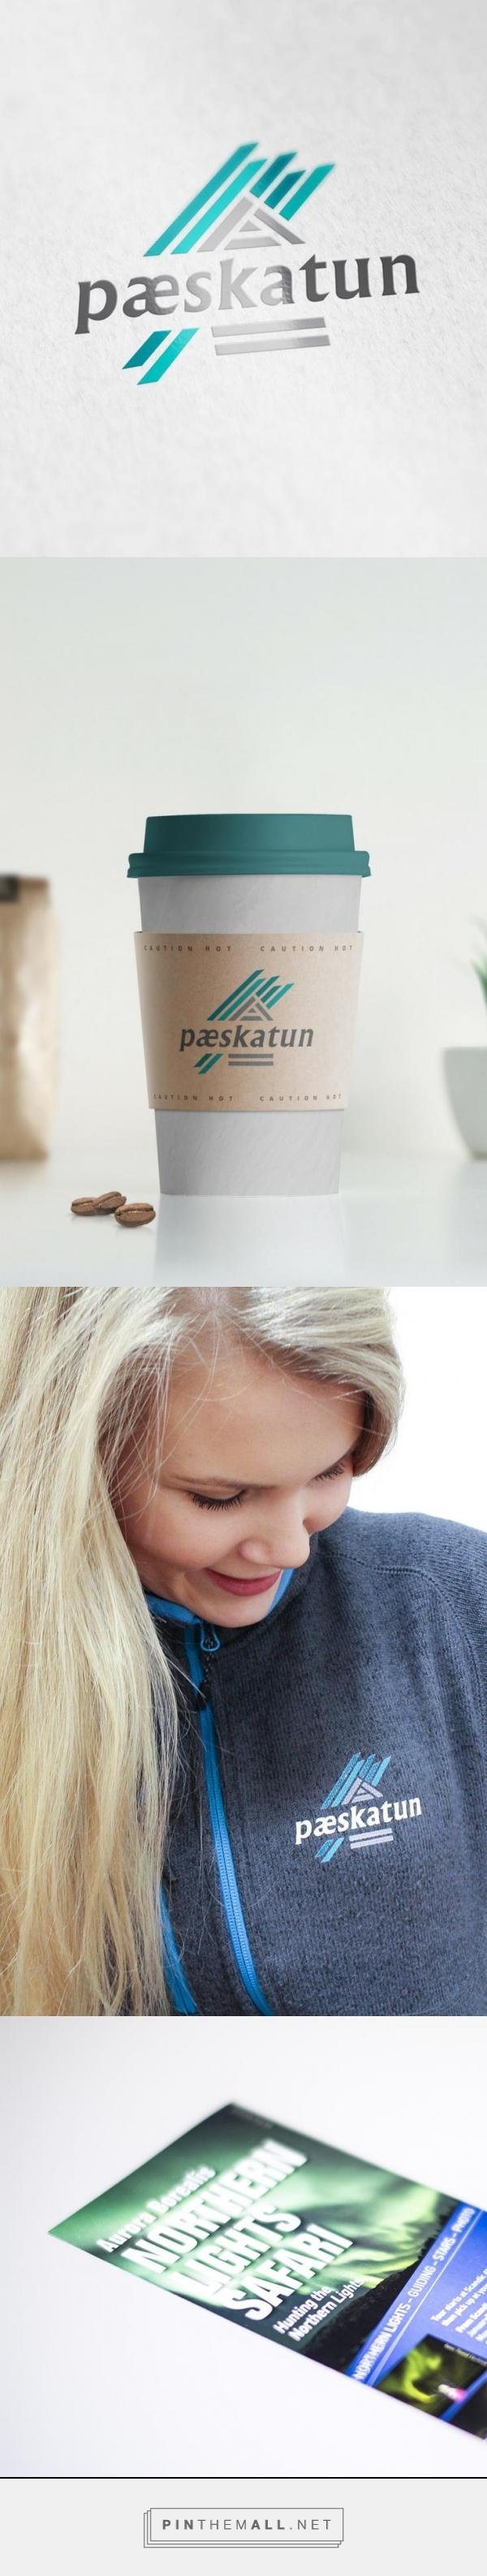 Brand and logo design for Pæskatun.